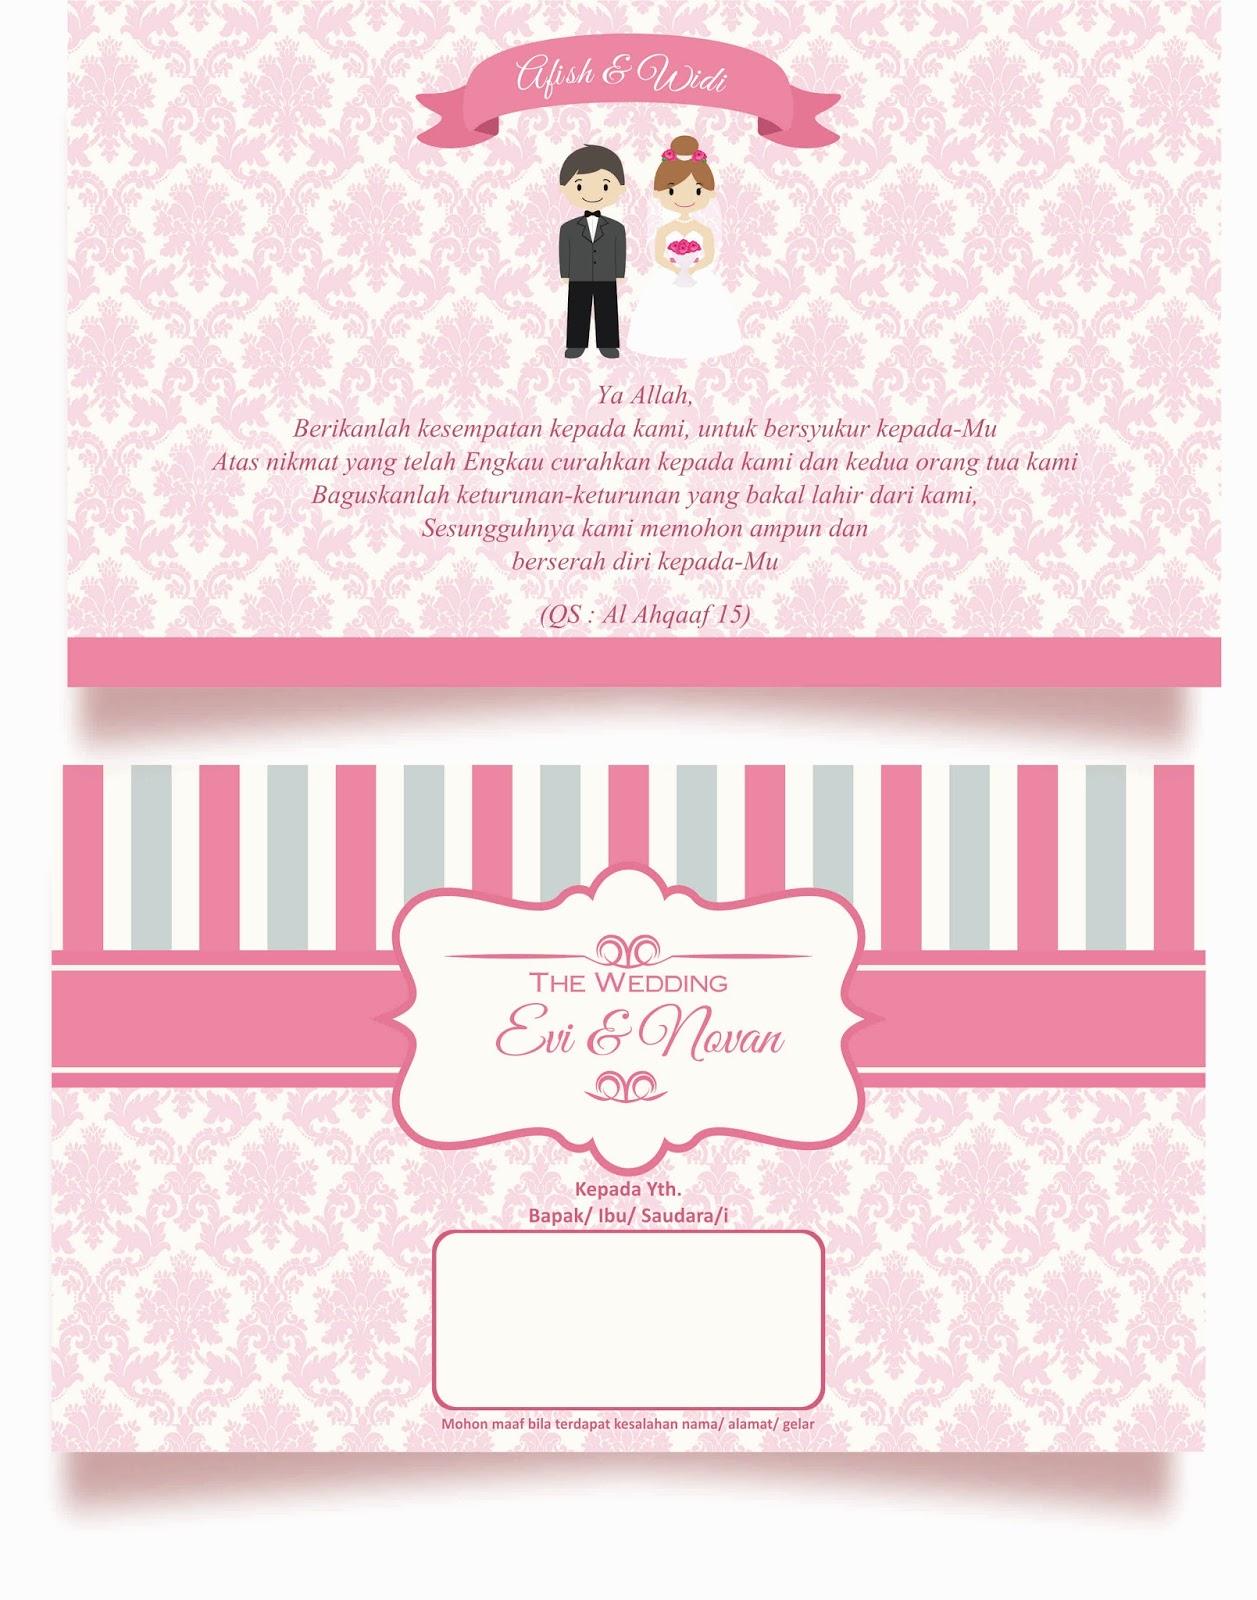 Vector Undangan Pernikahan Cdrp Staffwith